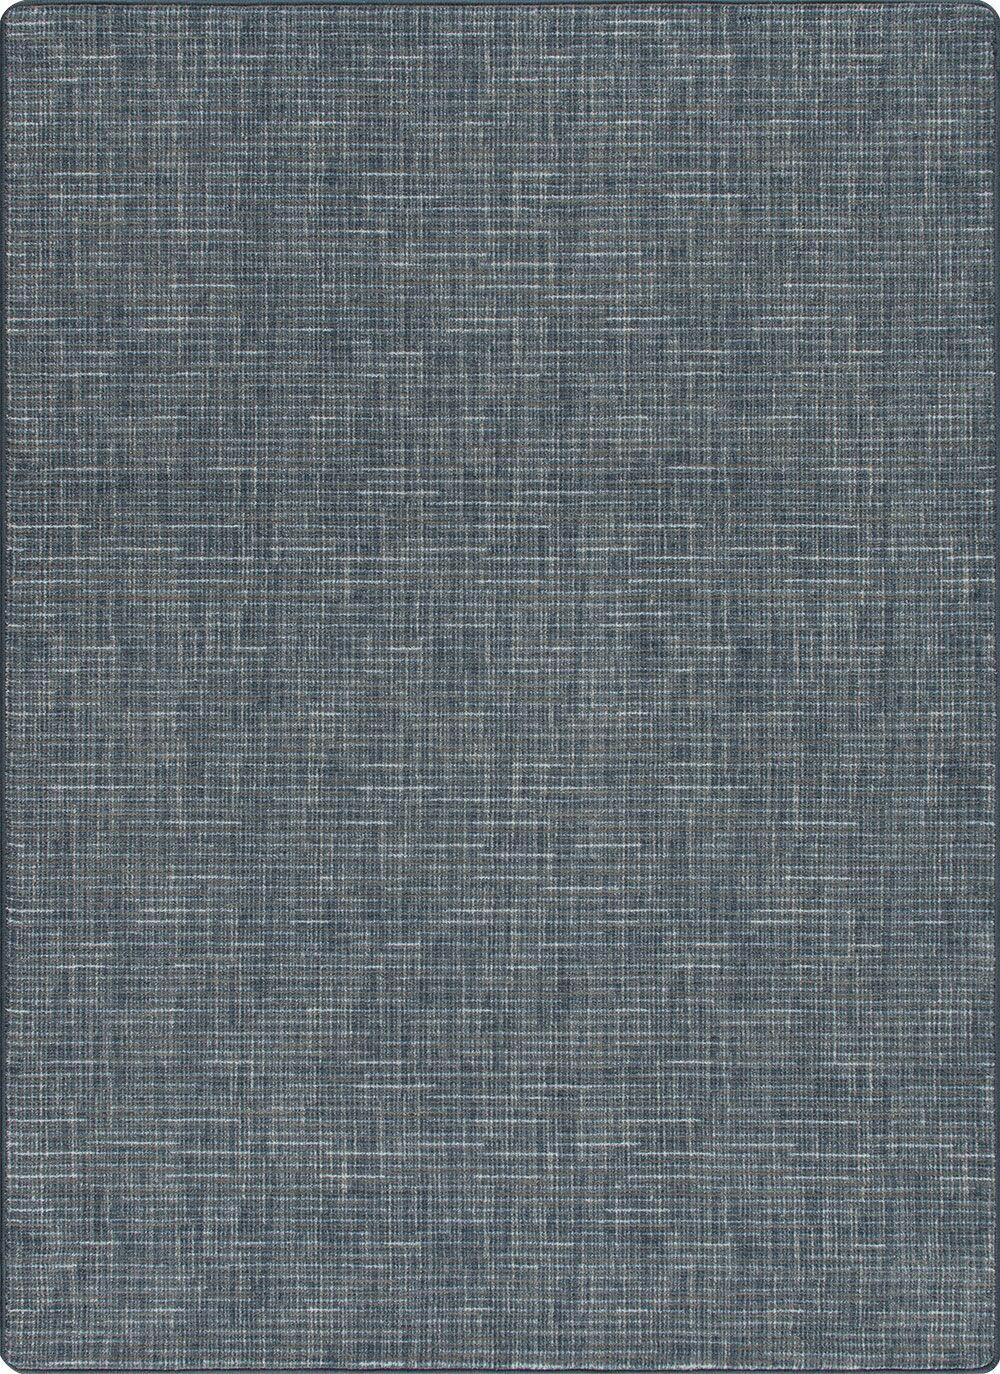 Risborough Broadcloth Brushed Denim Area Rug Rug Size: Rectangle 5'3